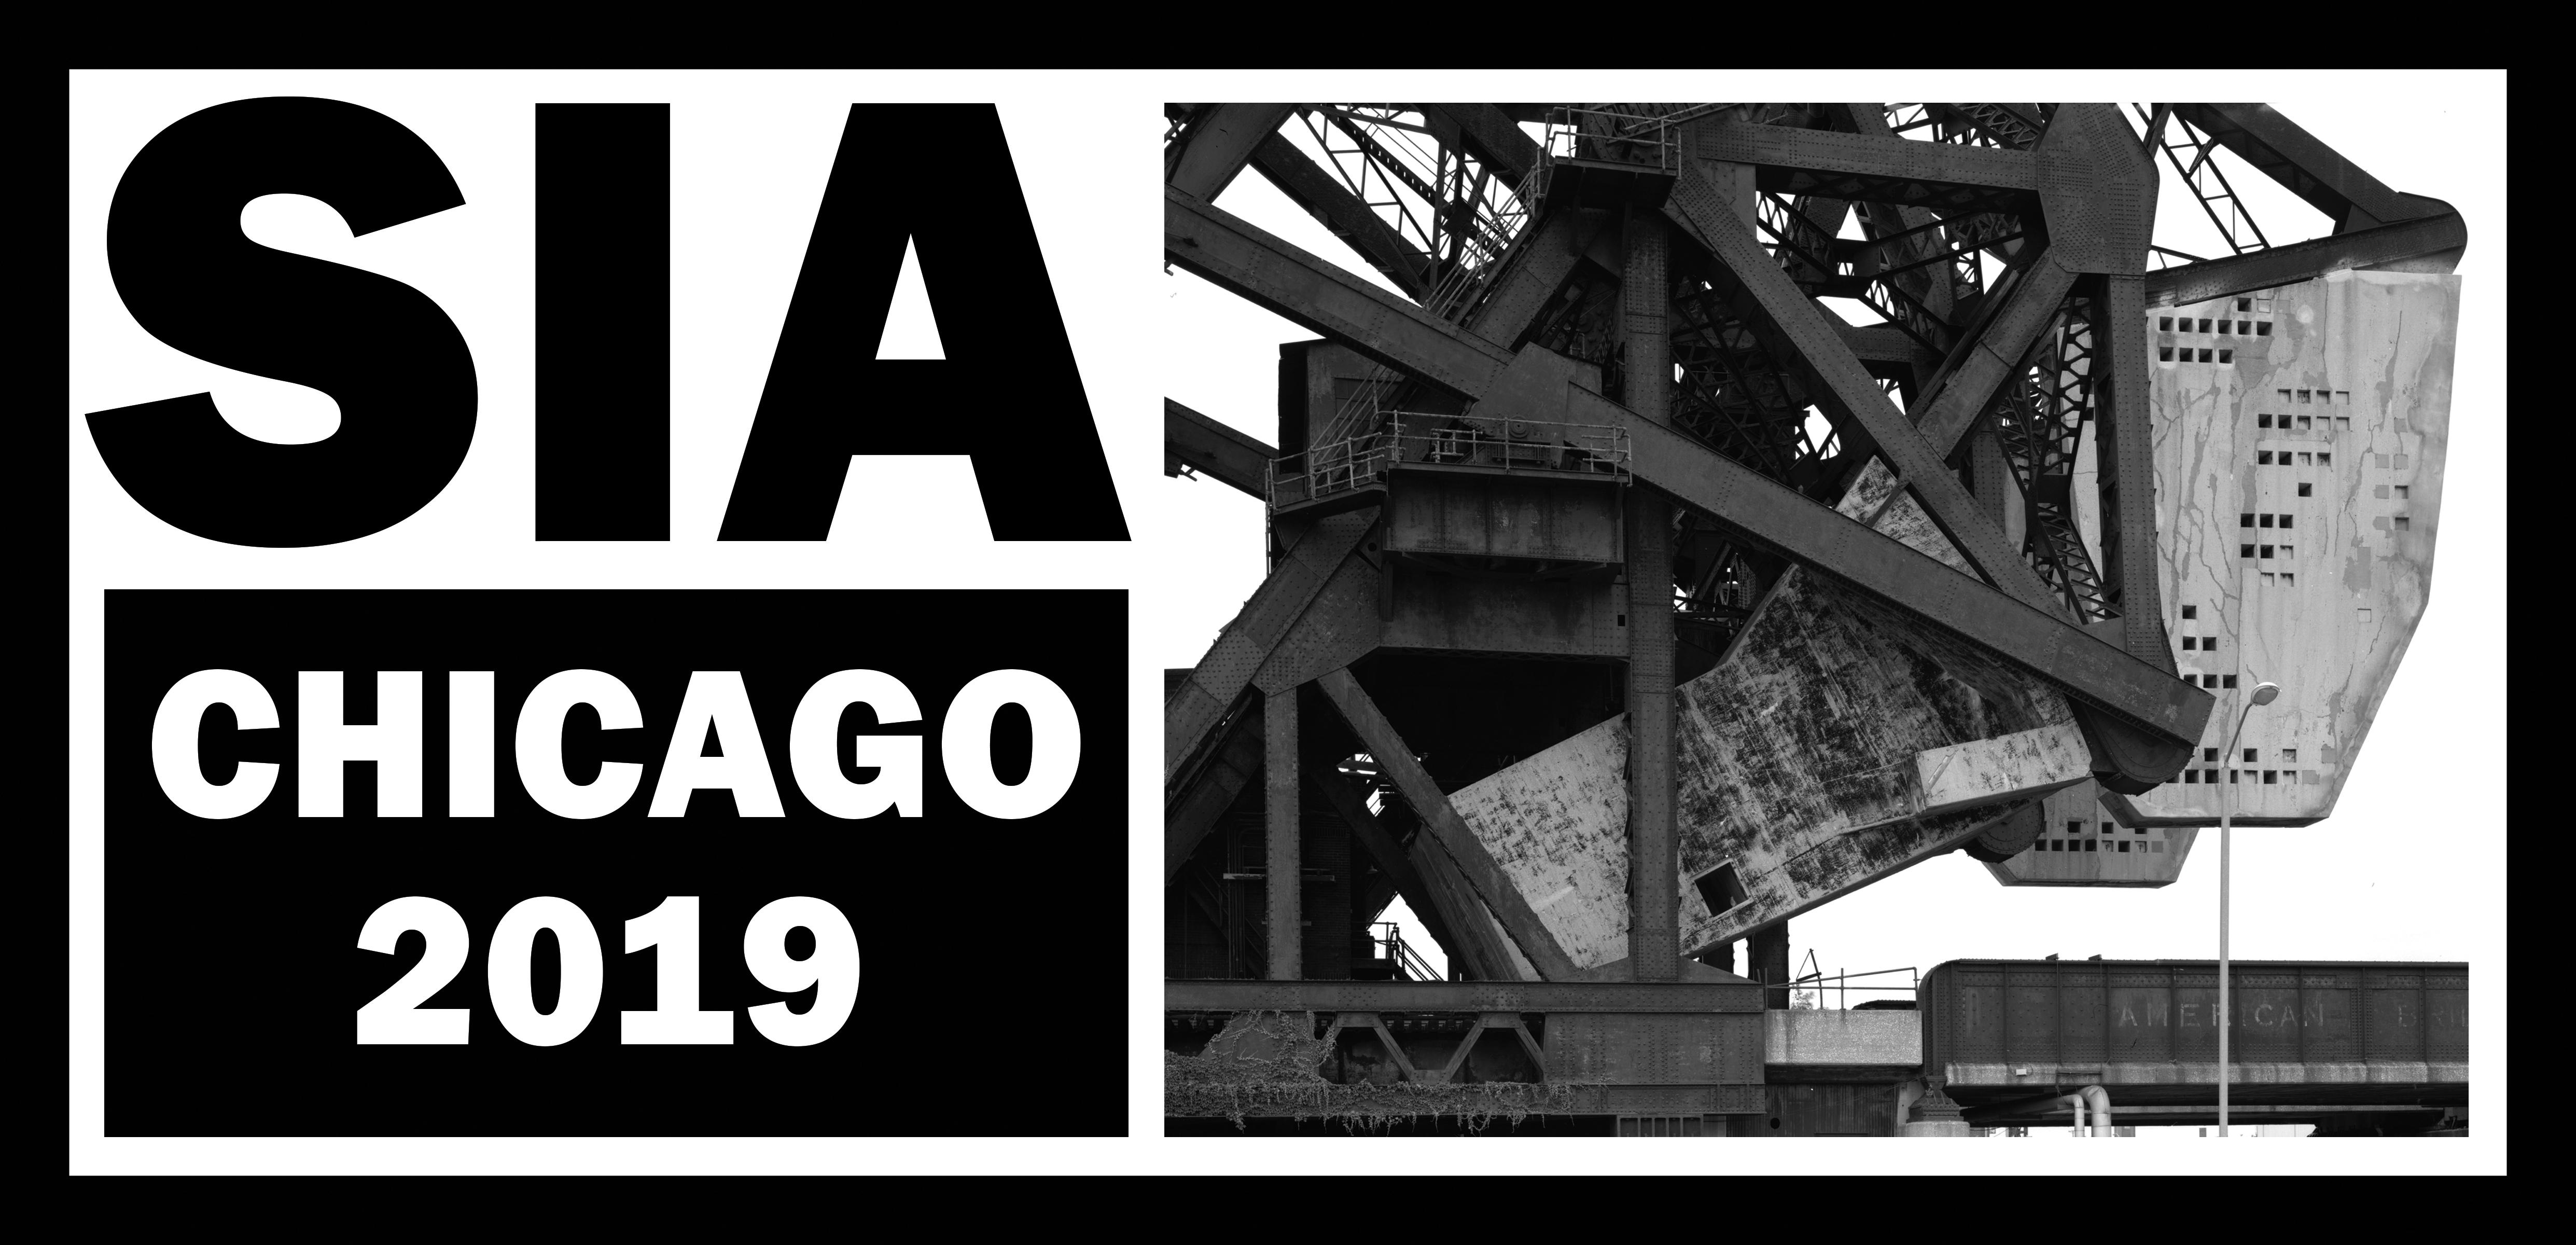 sia chicago 2019 � hotel amp travel information